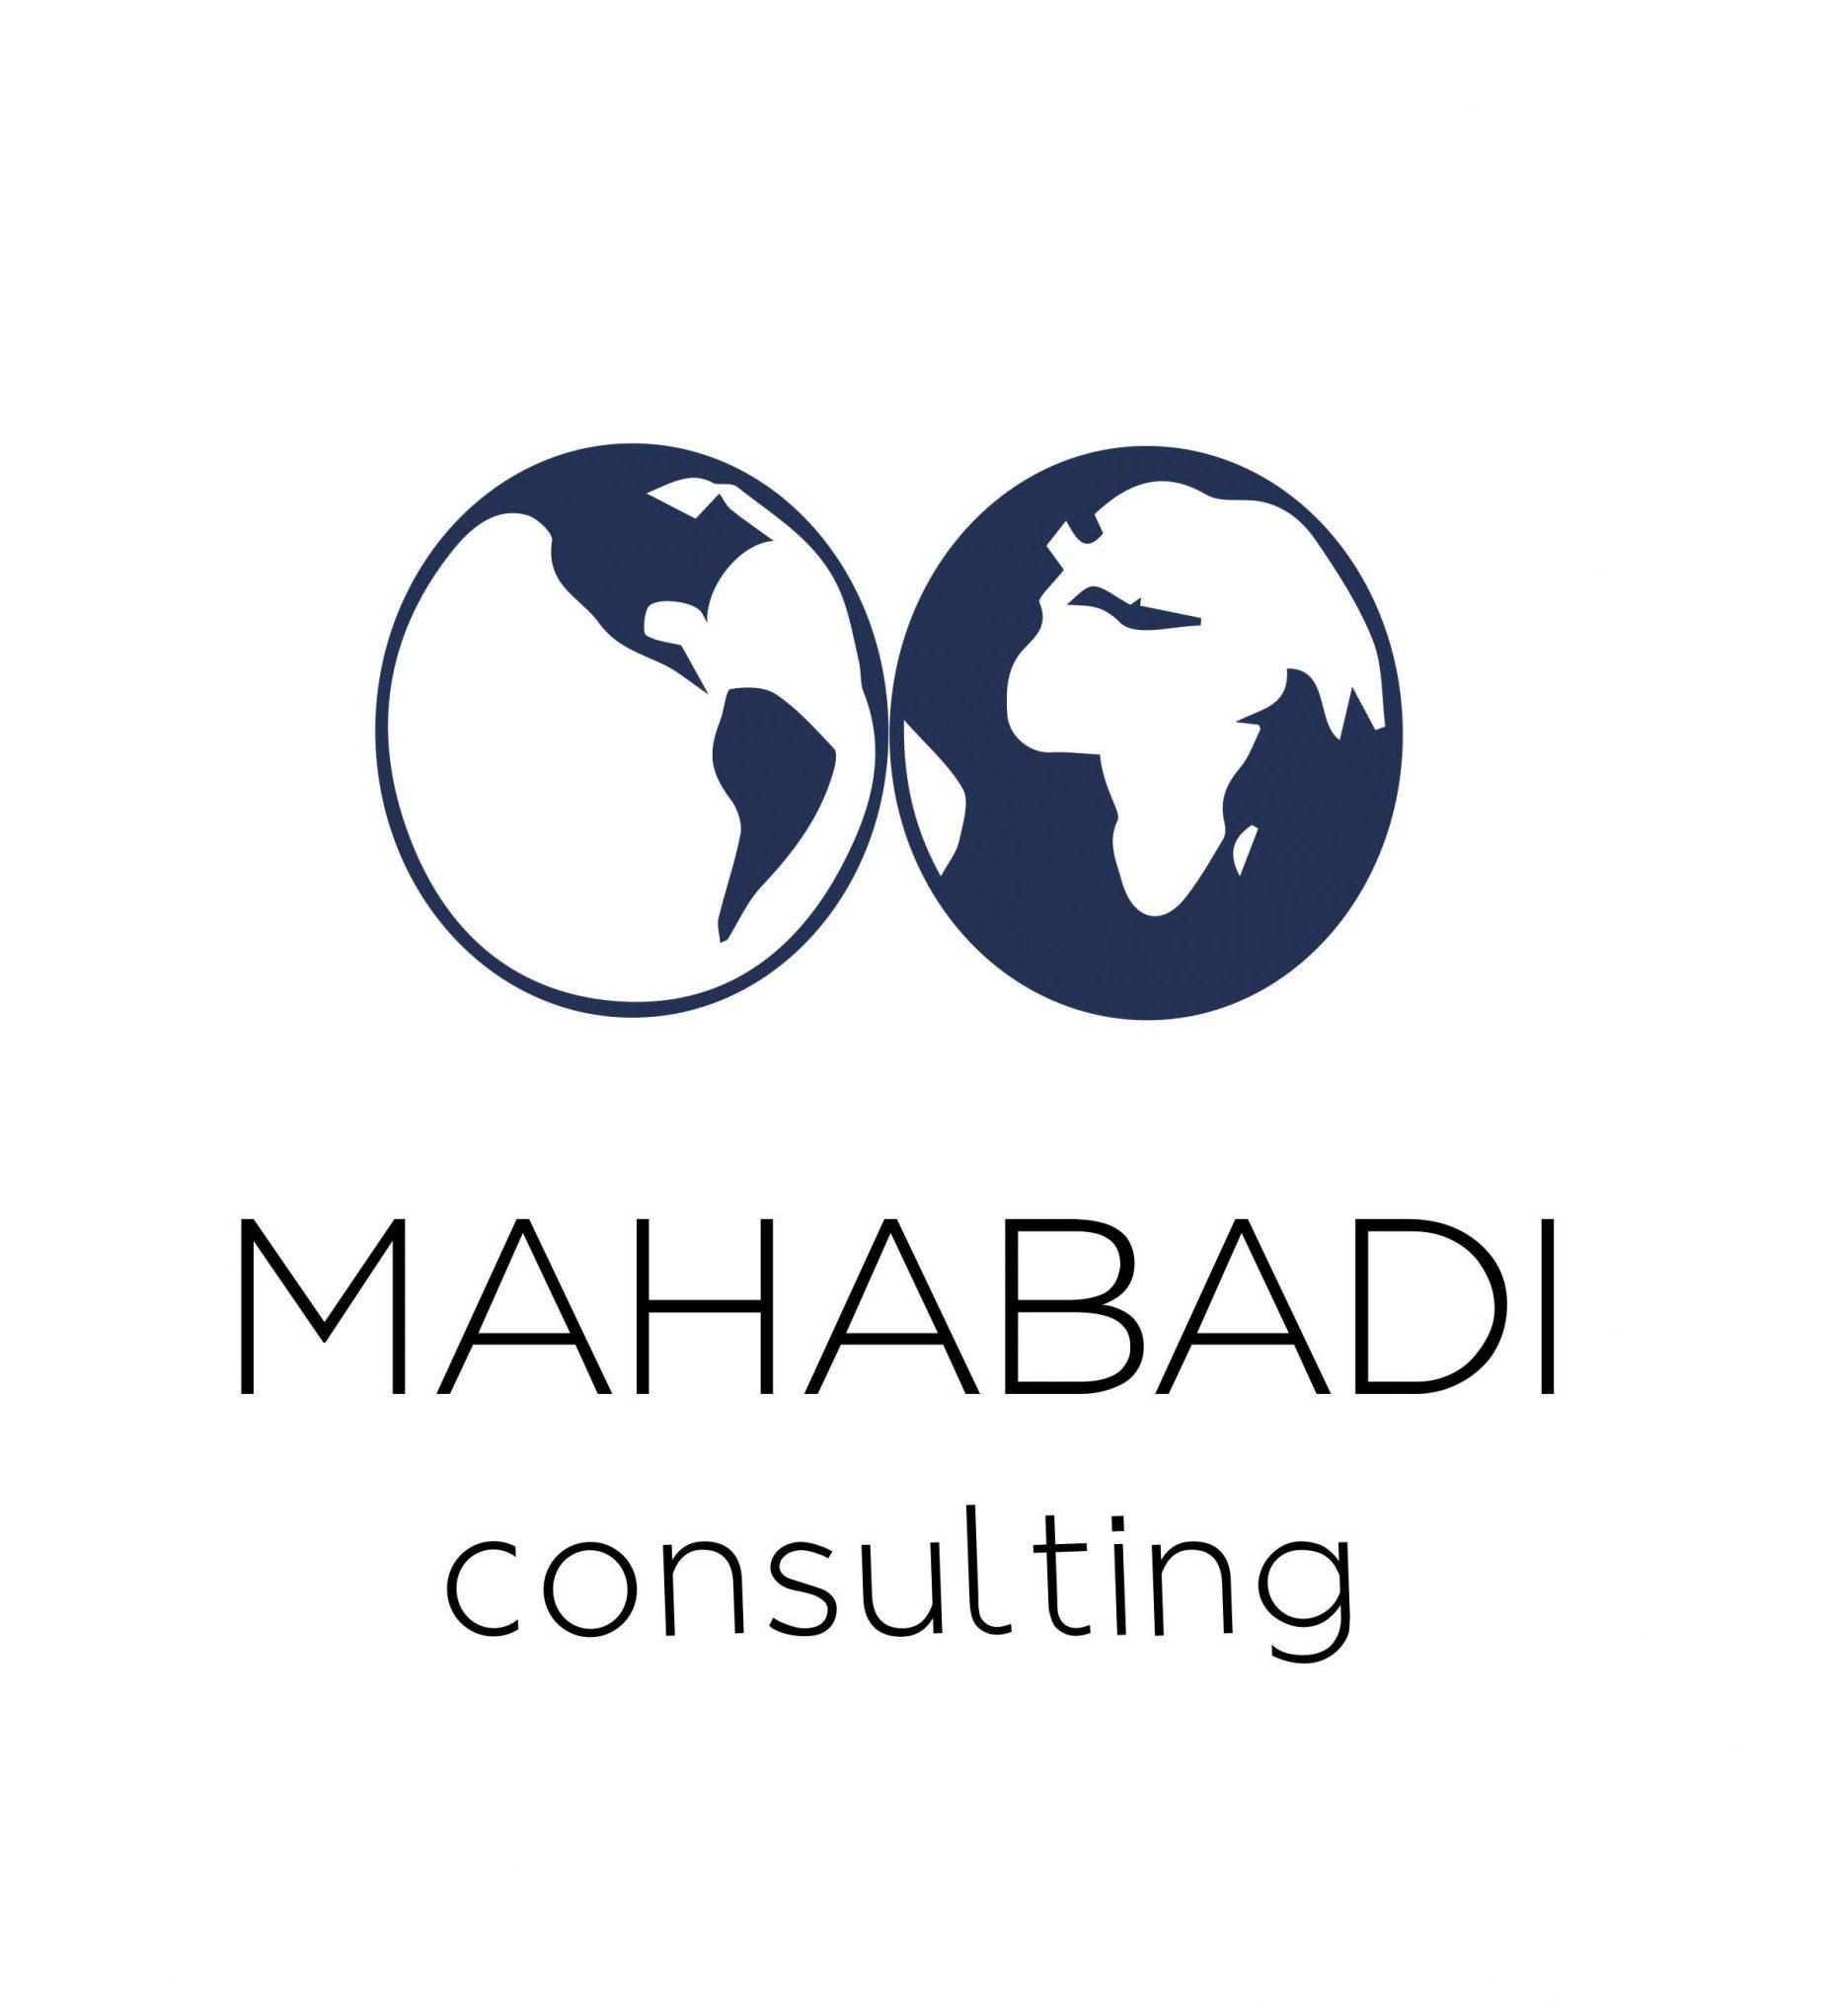 Mahabadi Consulting